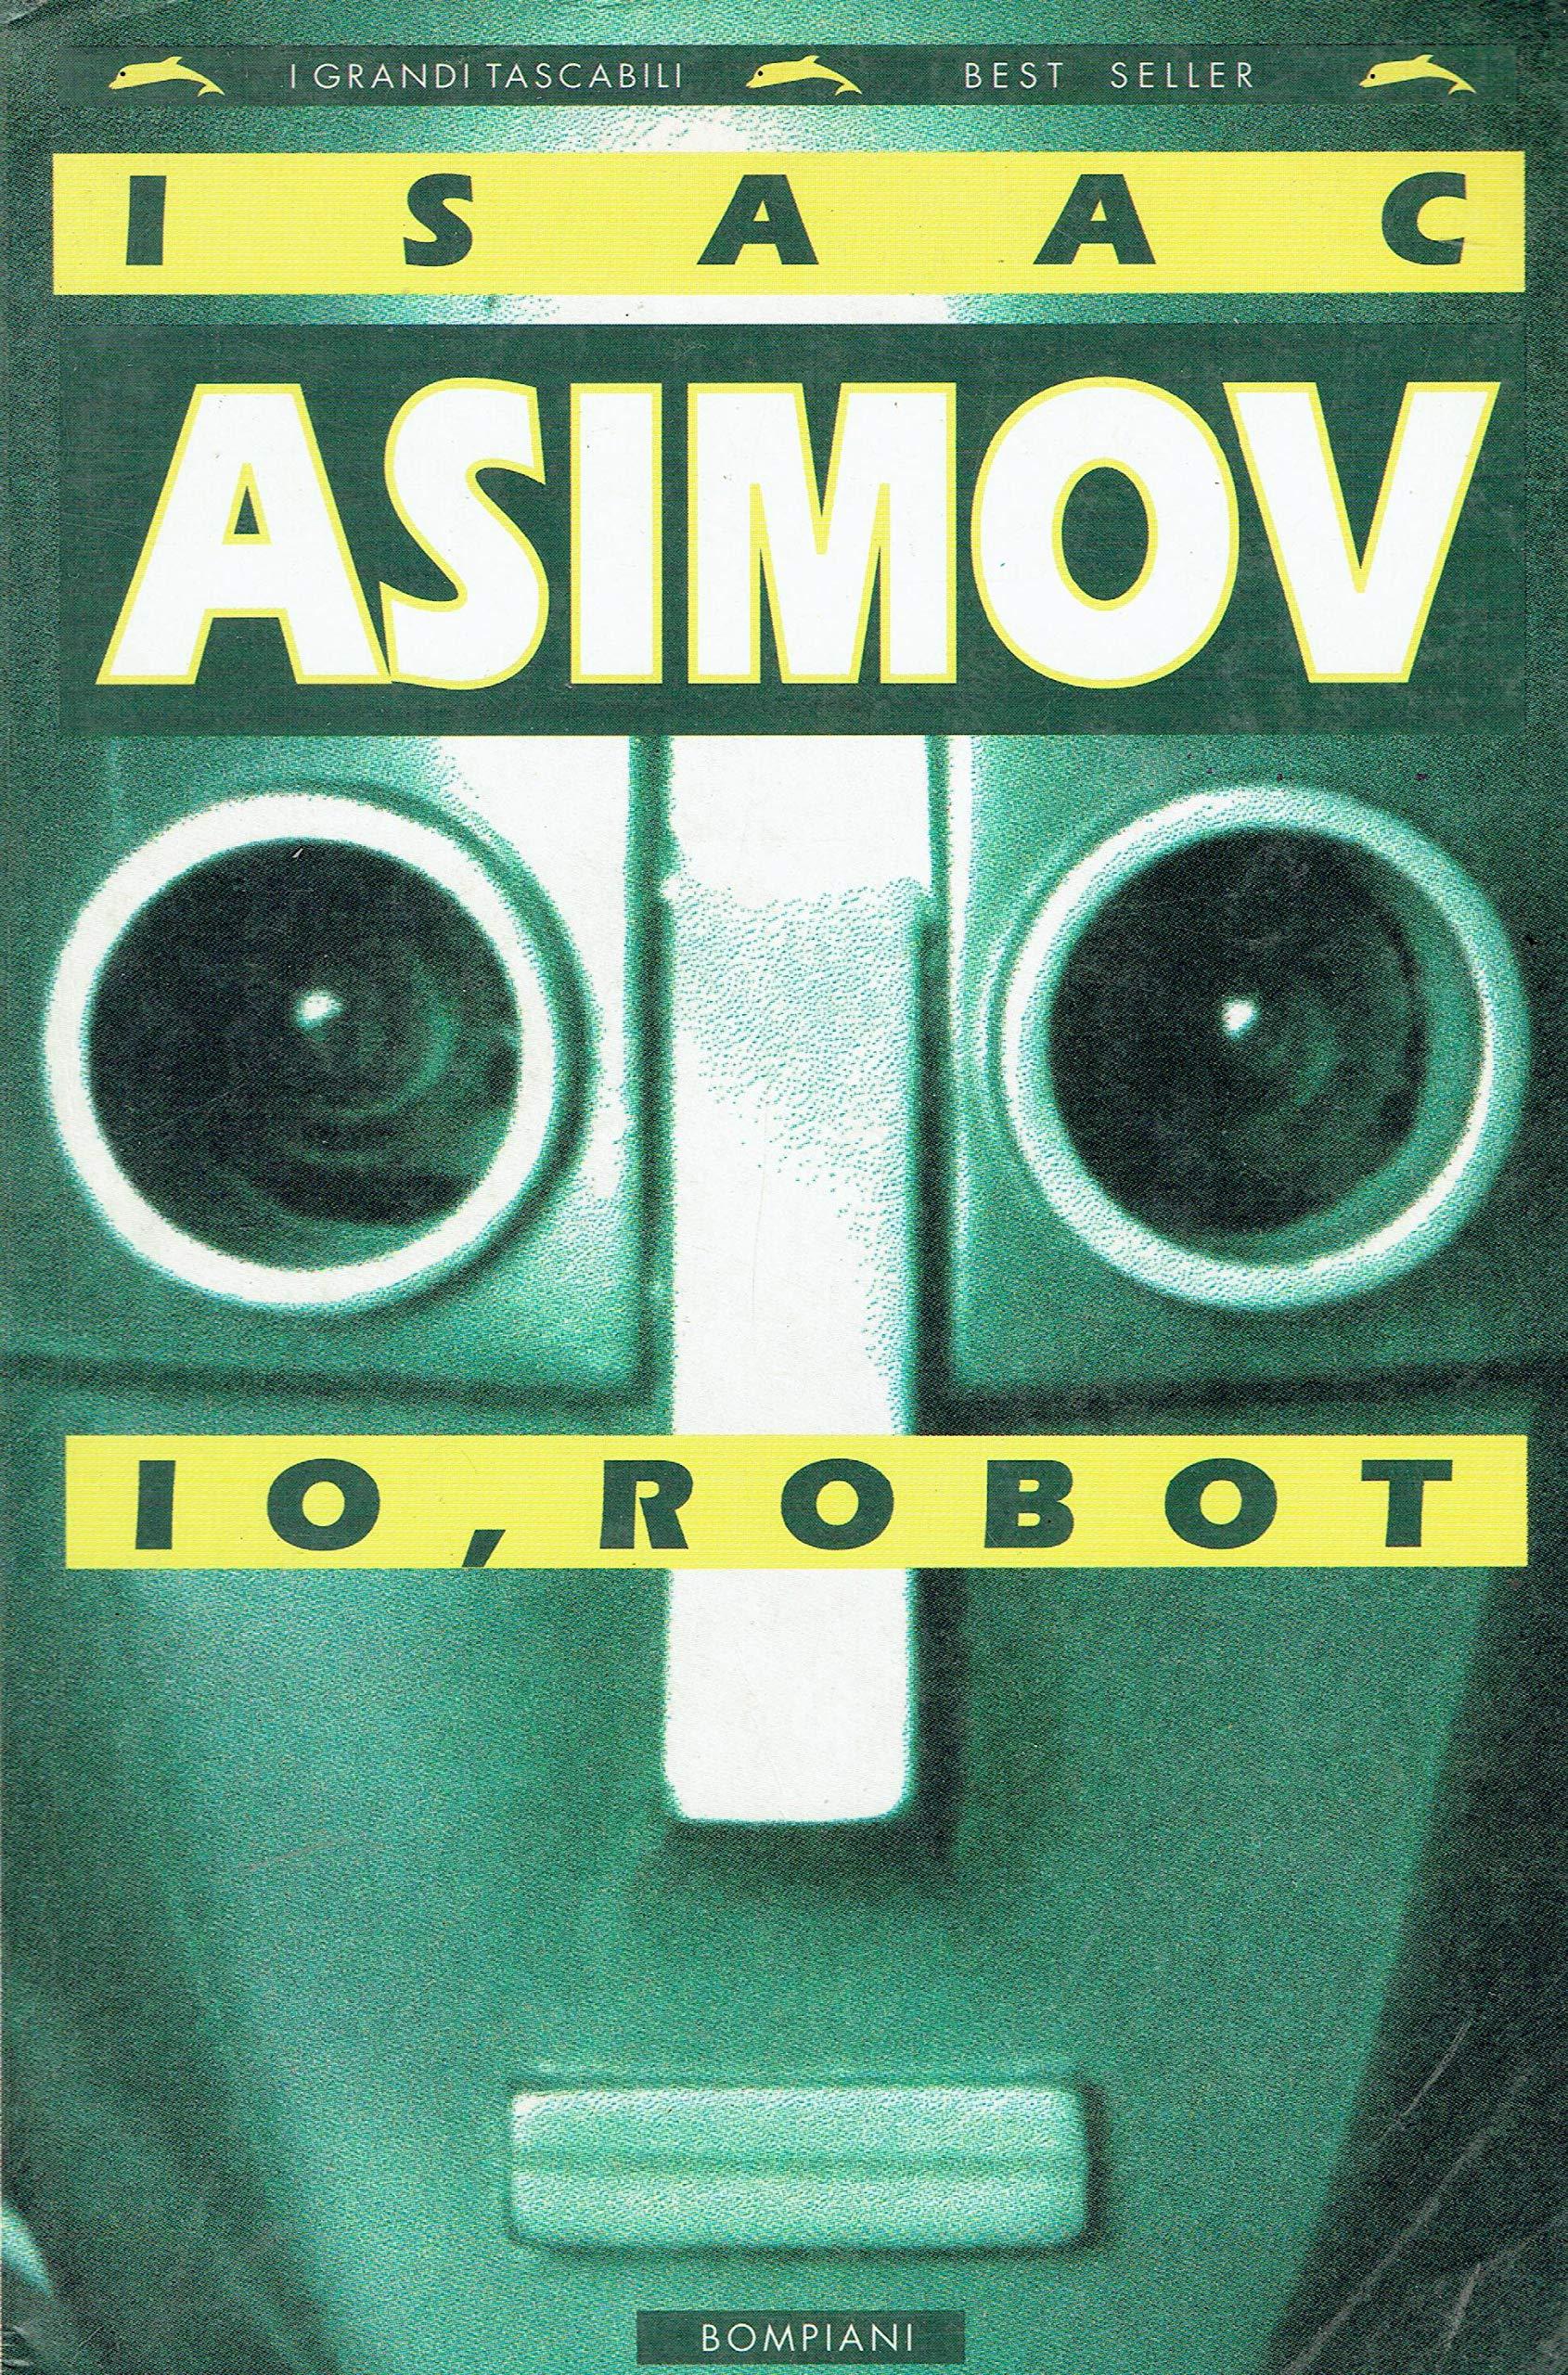 Amazon.it: Io, robot - Asimov, Isaac, Rambelli, R. - Libri